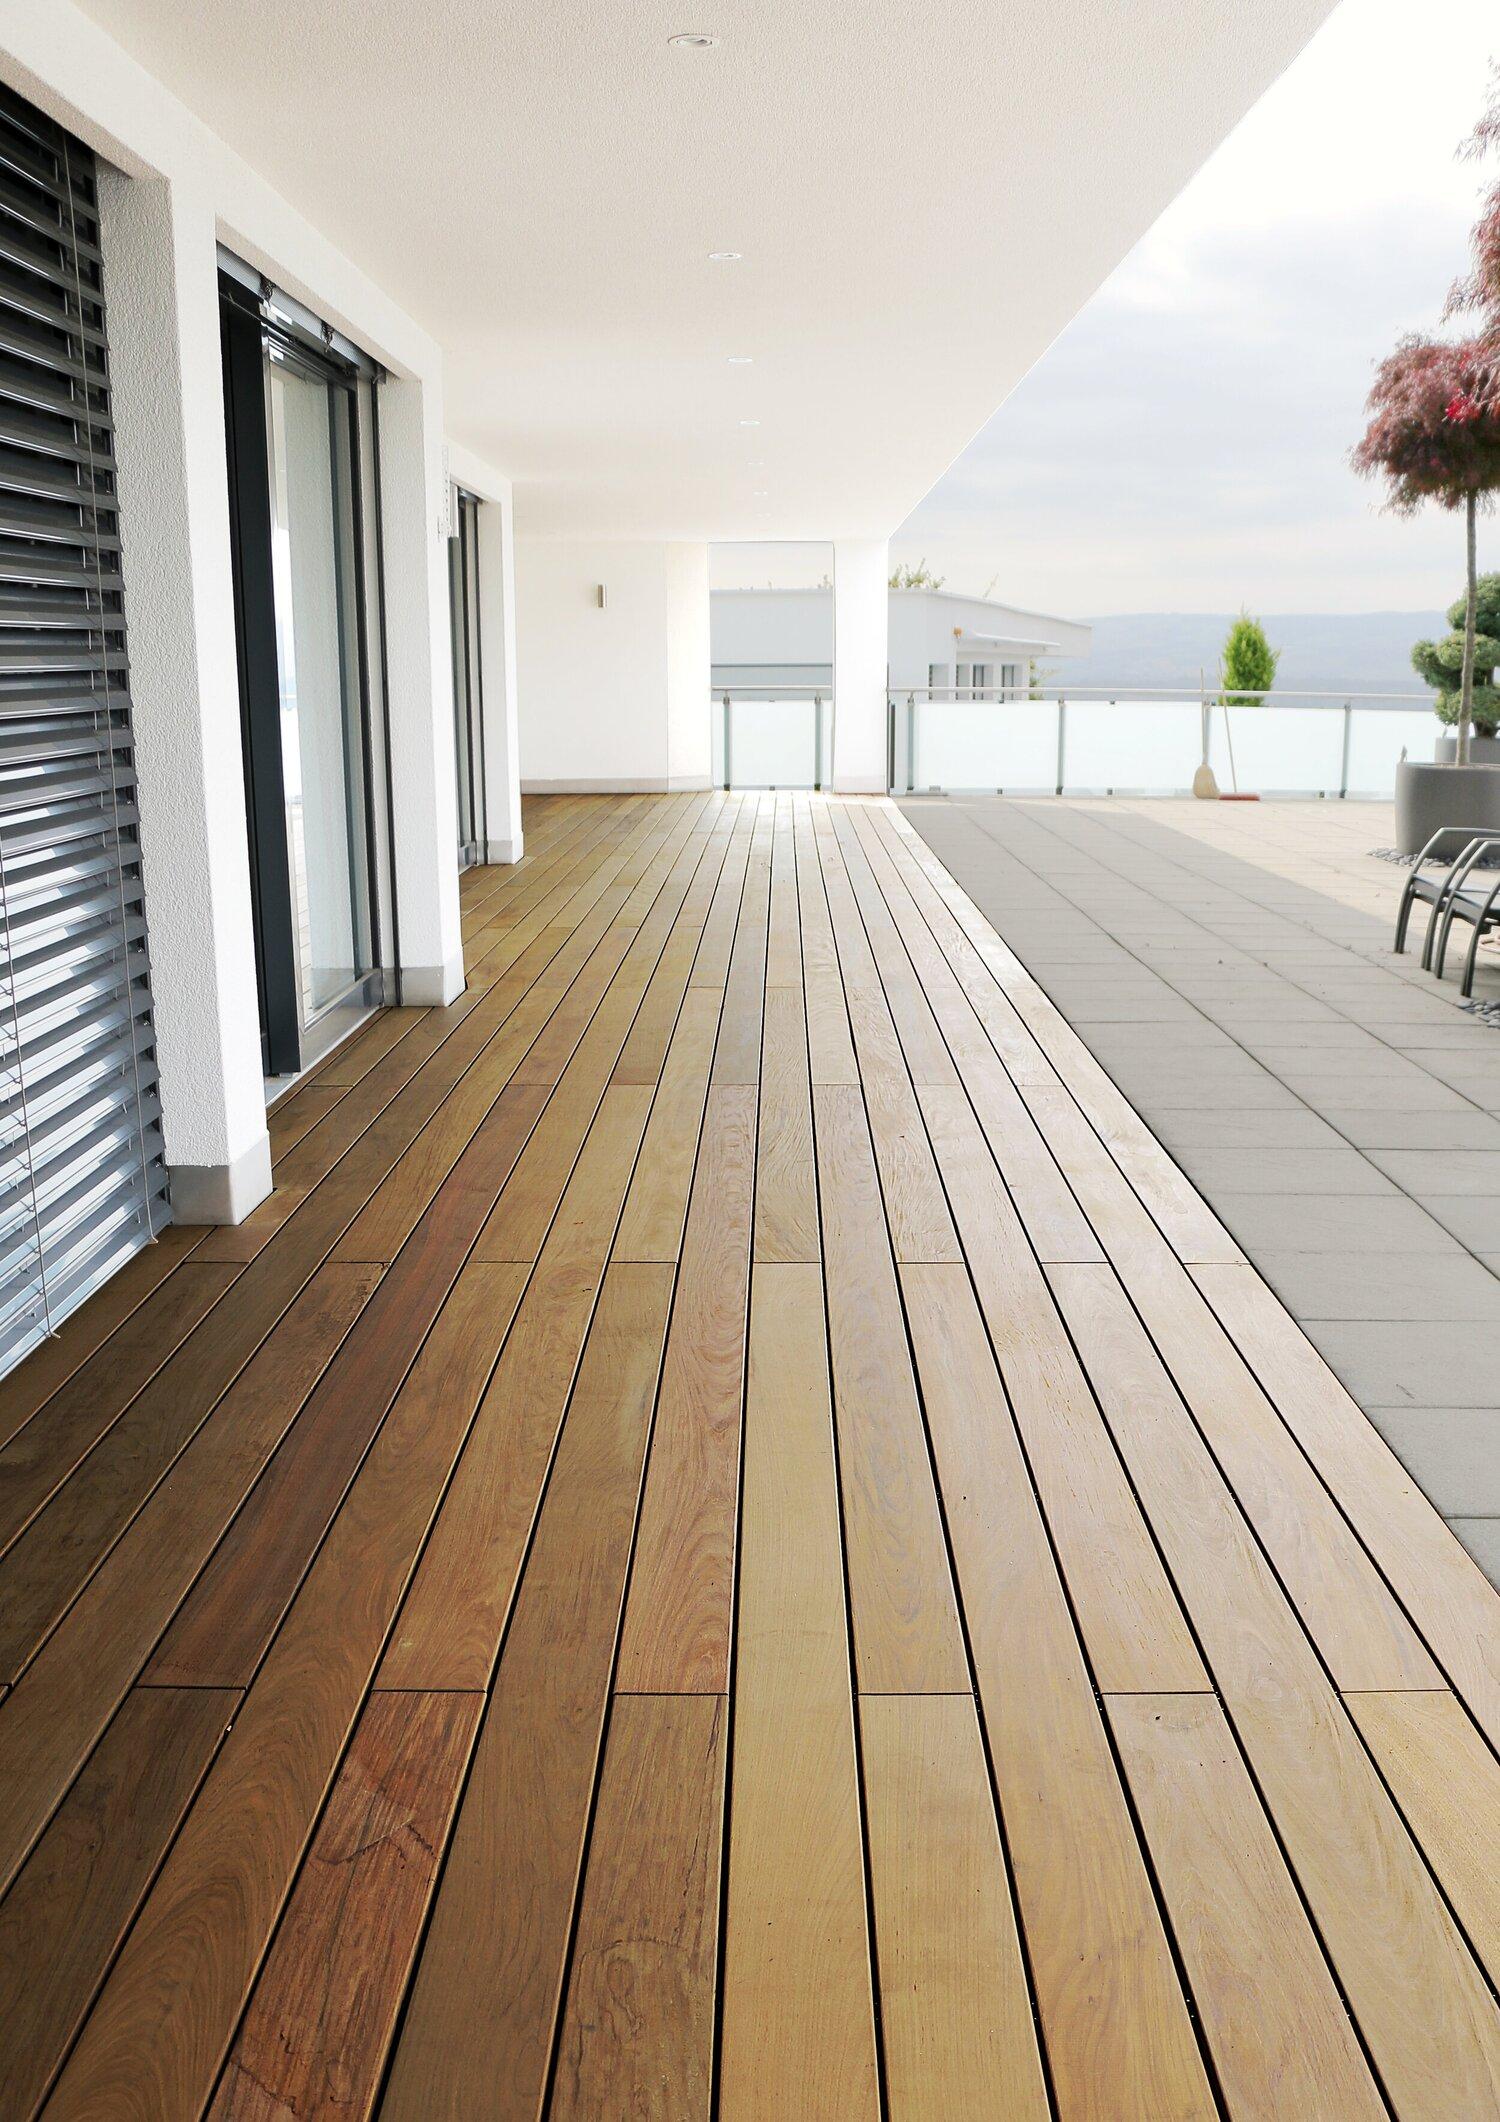 Terrasse aus Ipé Hartholz / Widen, Aargau — Ryser Böden